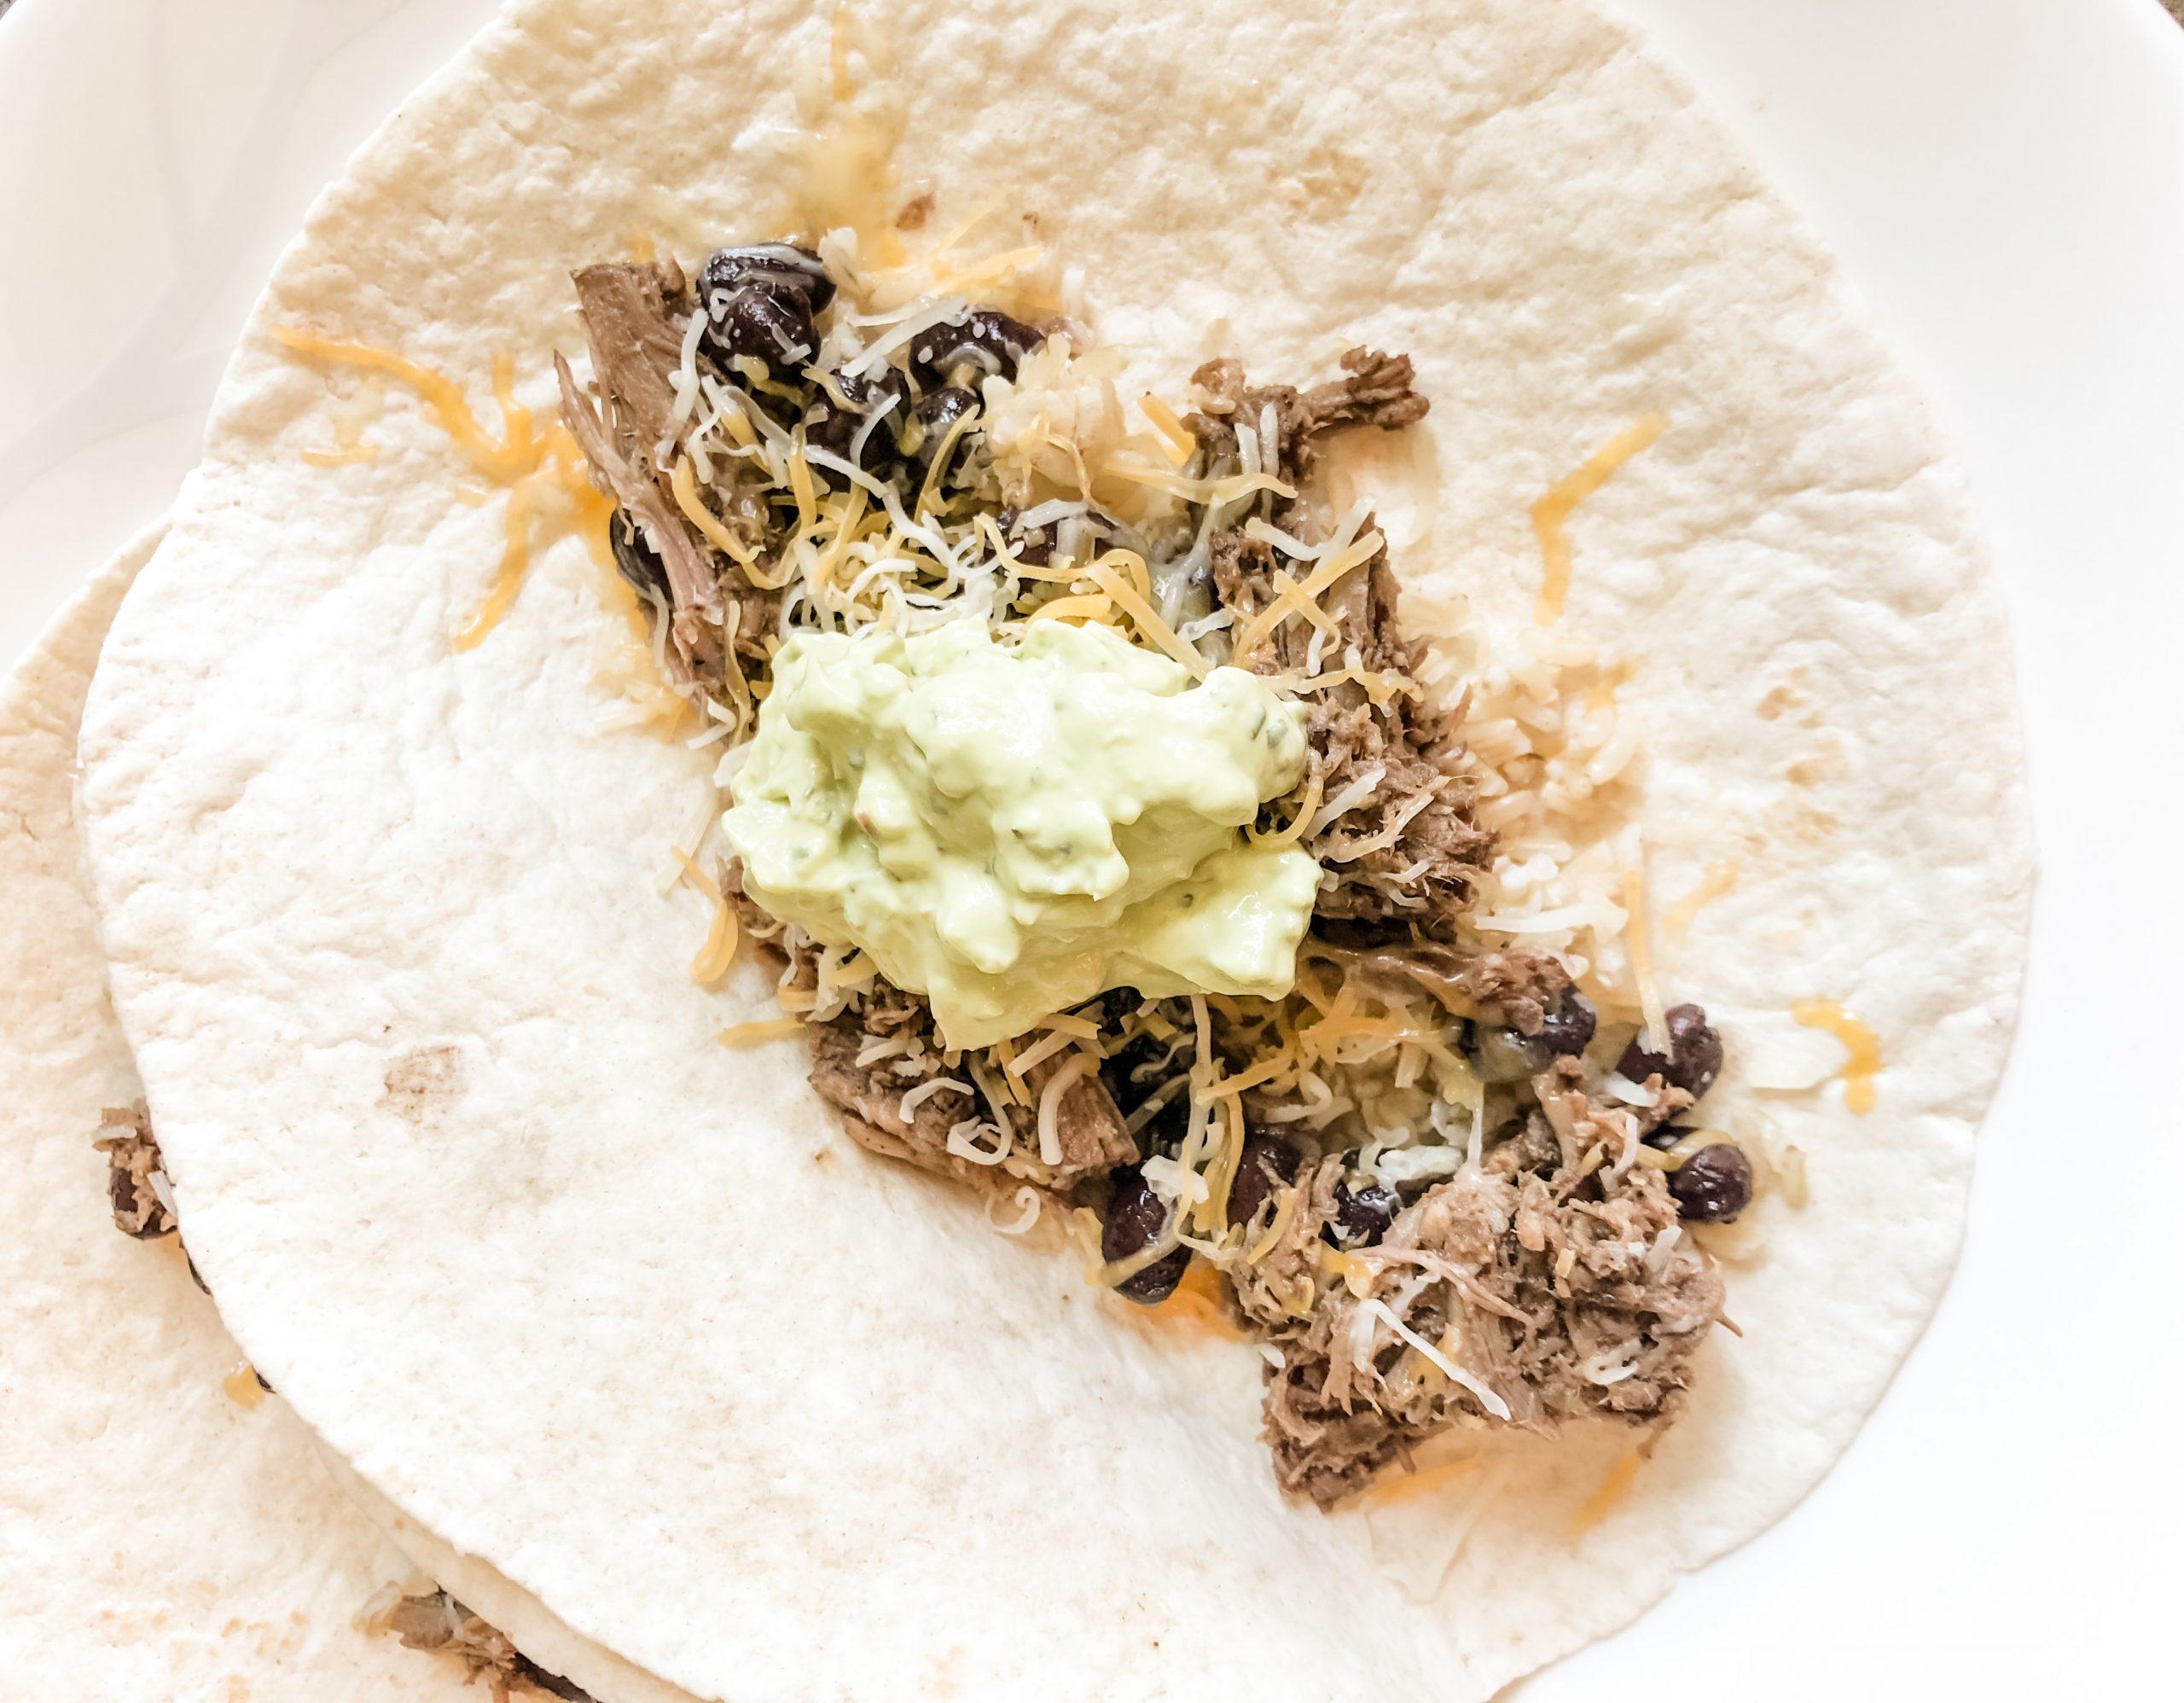 barbacoa tacos served